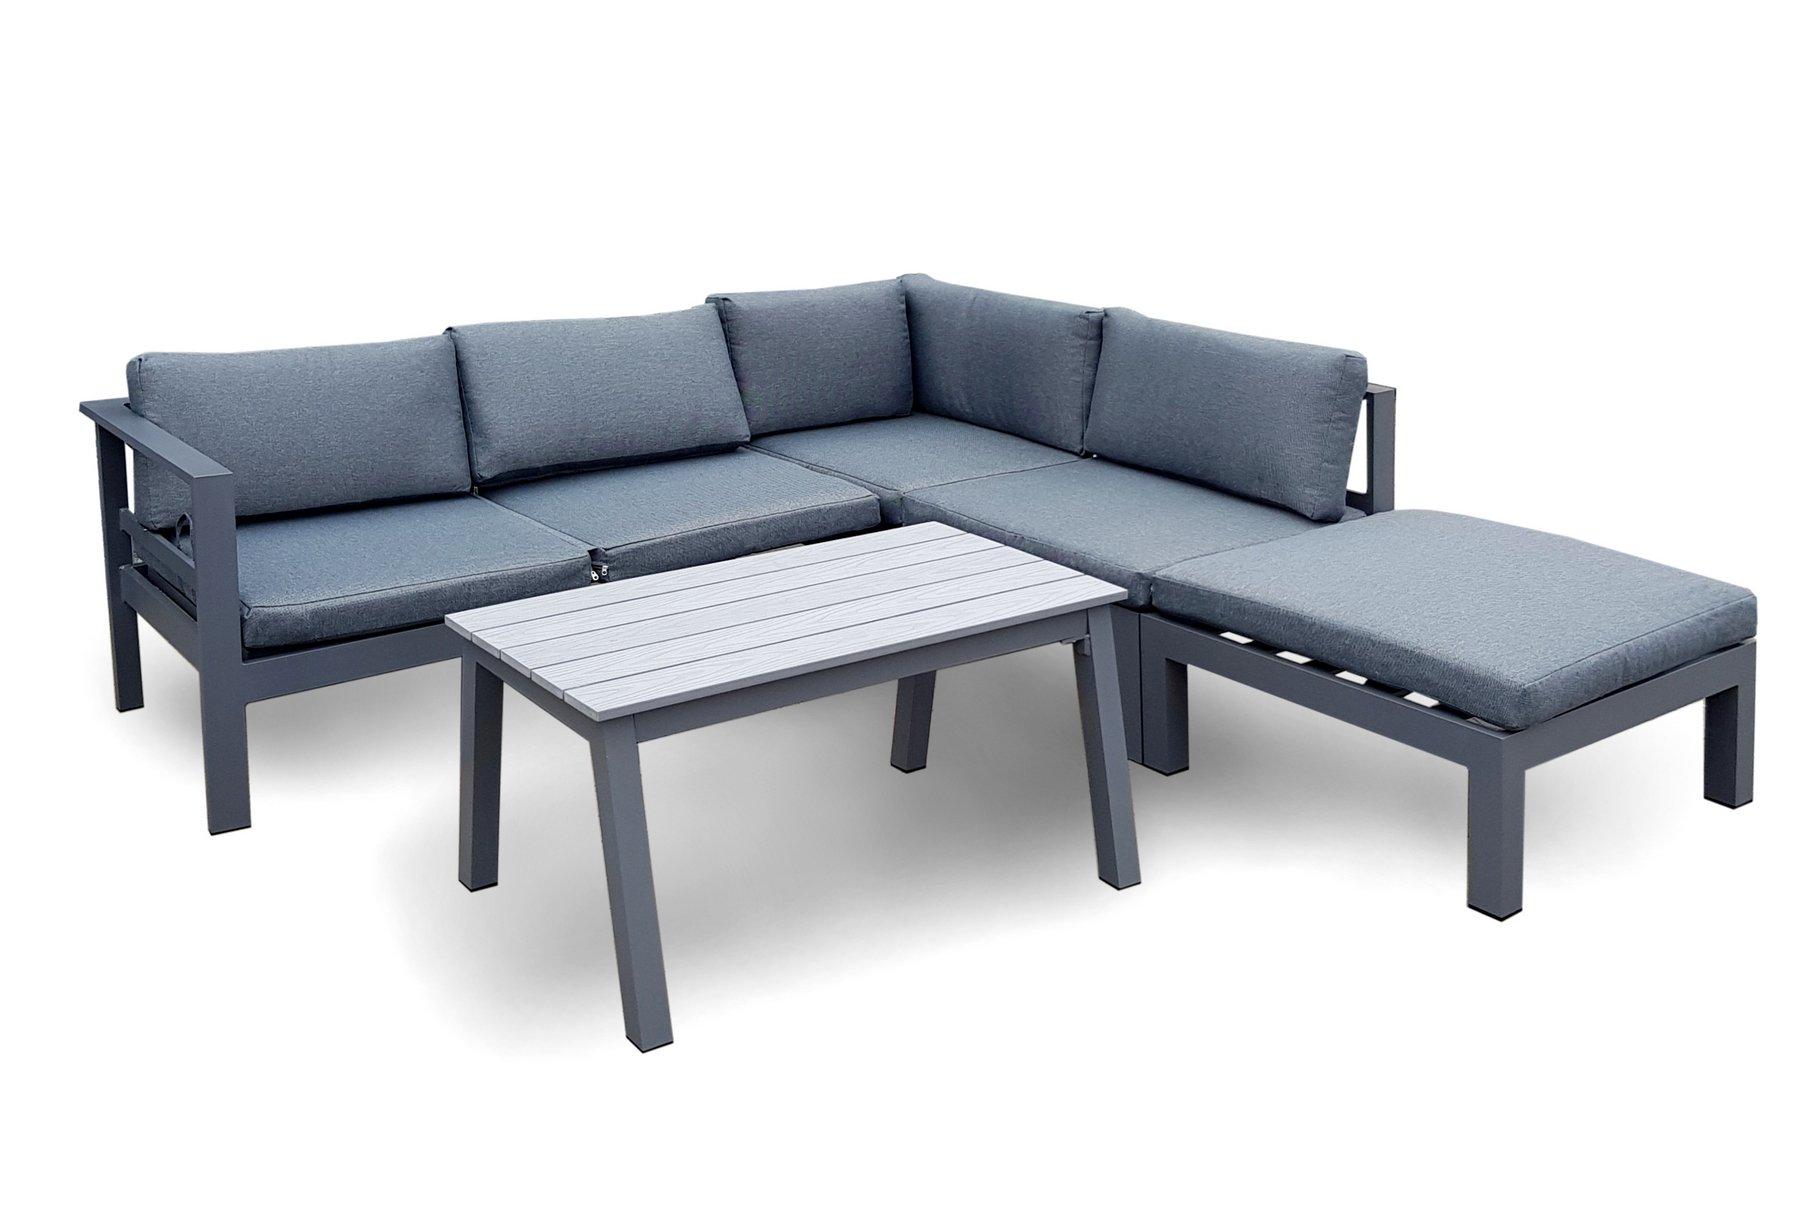 osoltus gartenlounge alu lounge copenhagen modern weiss ebay. Black Bedroom Furniture Sets. Home Design Ideas